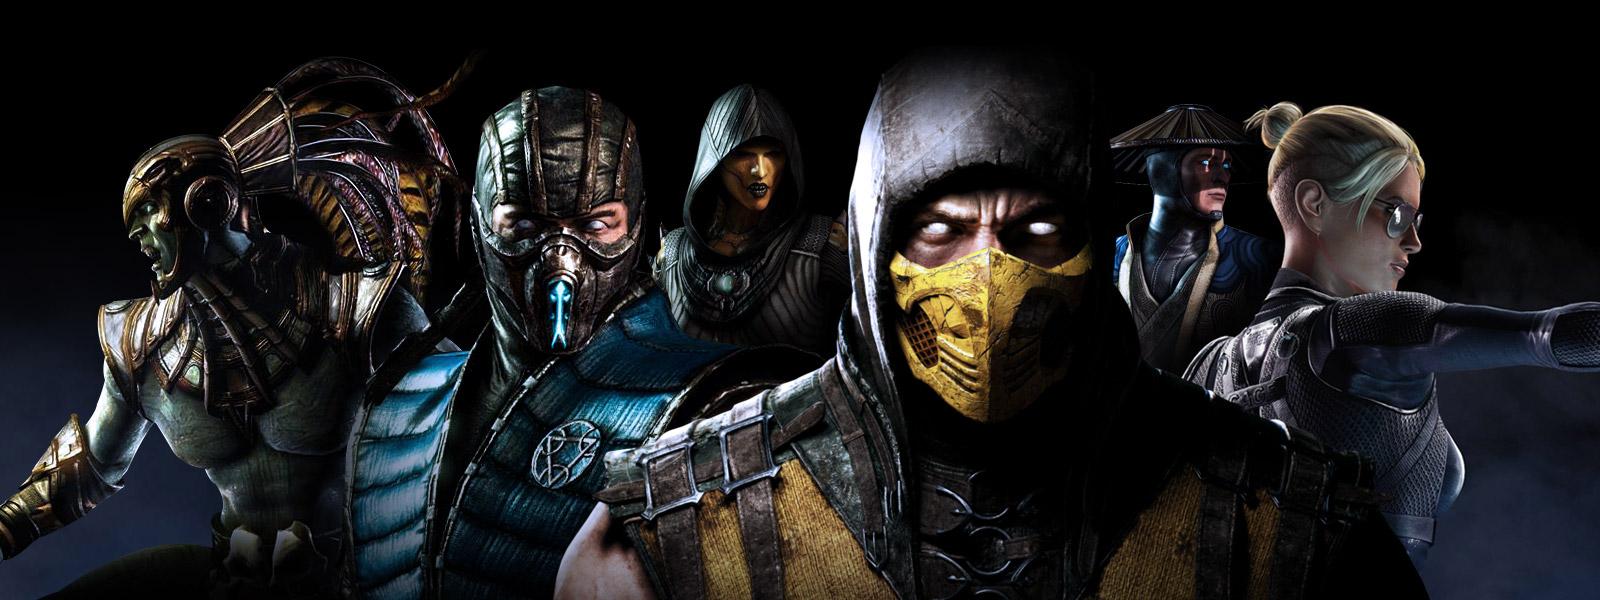 Mortal Kombat X 2016 Dlc Details